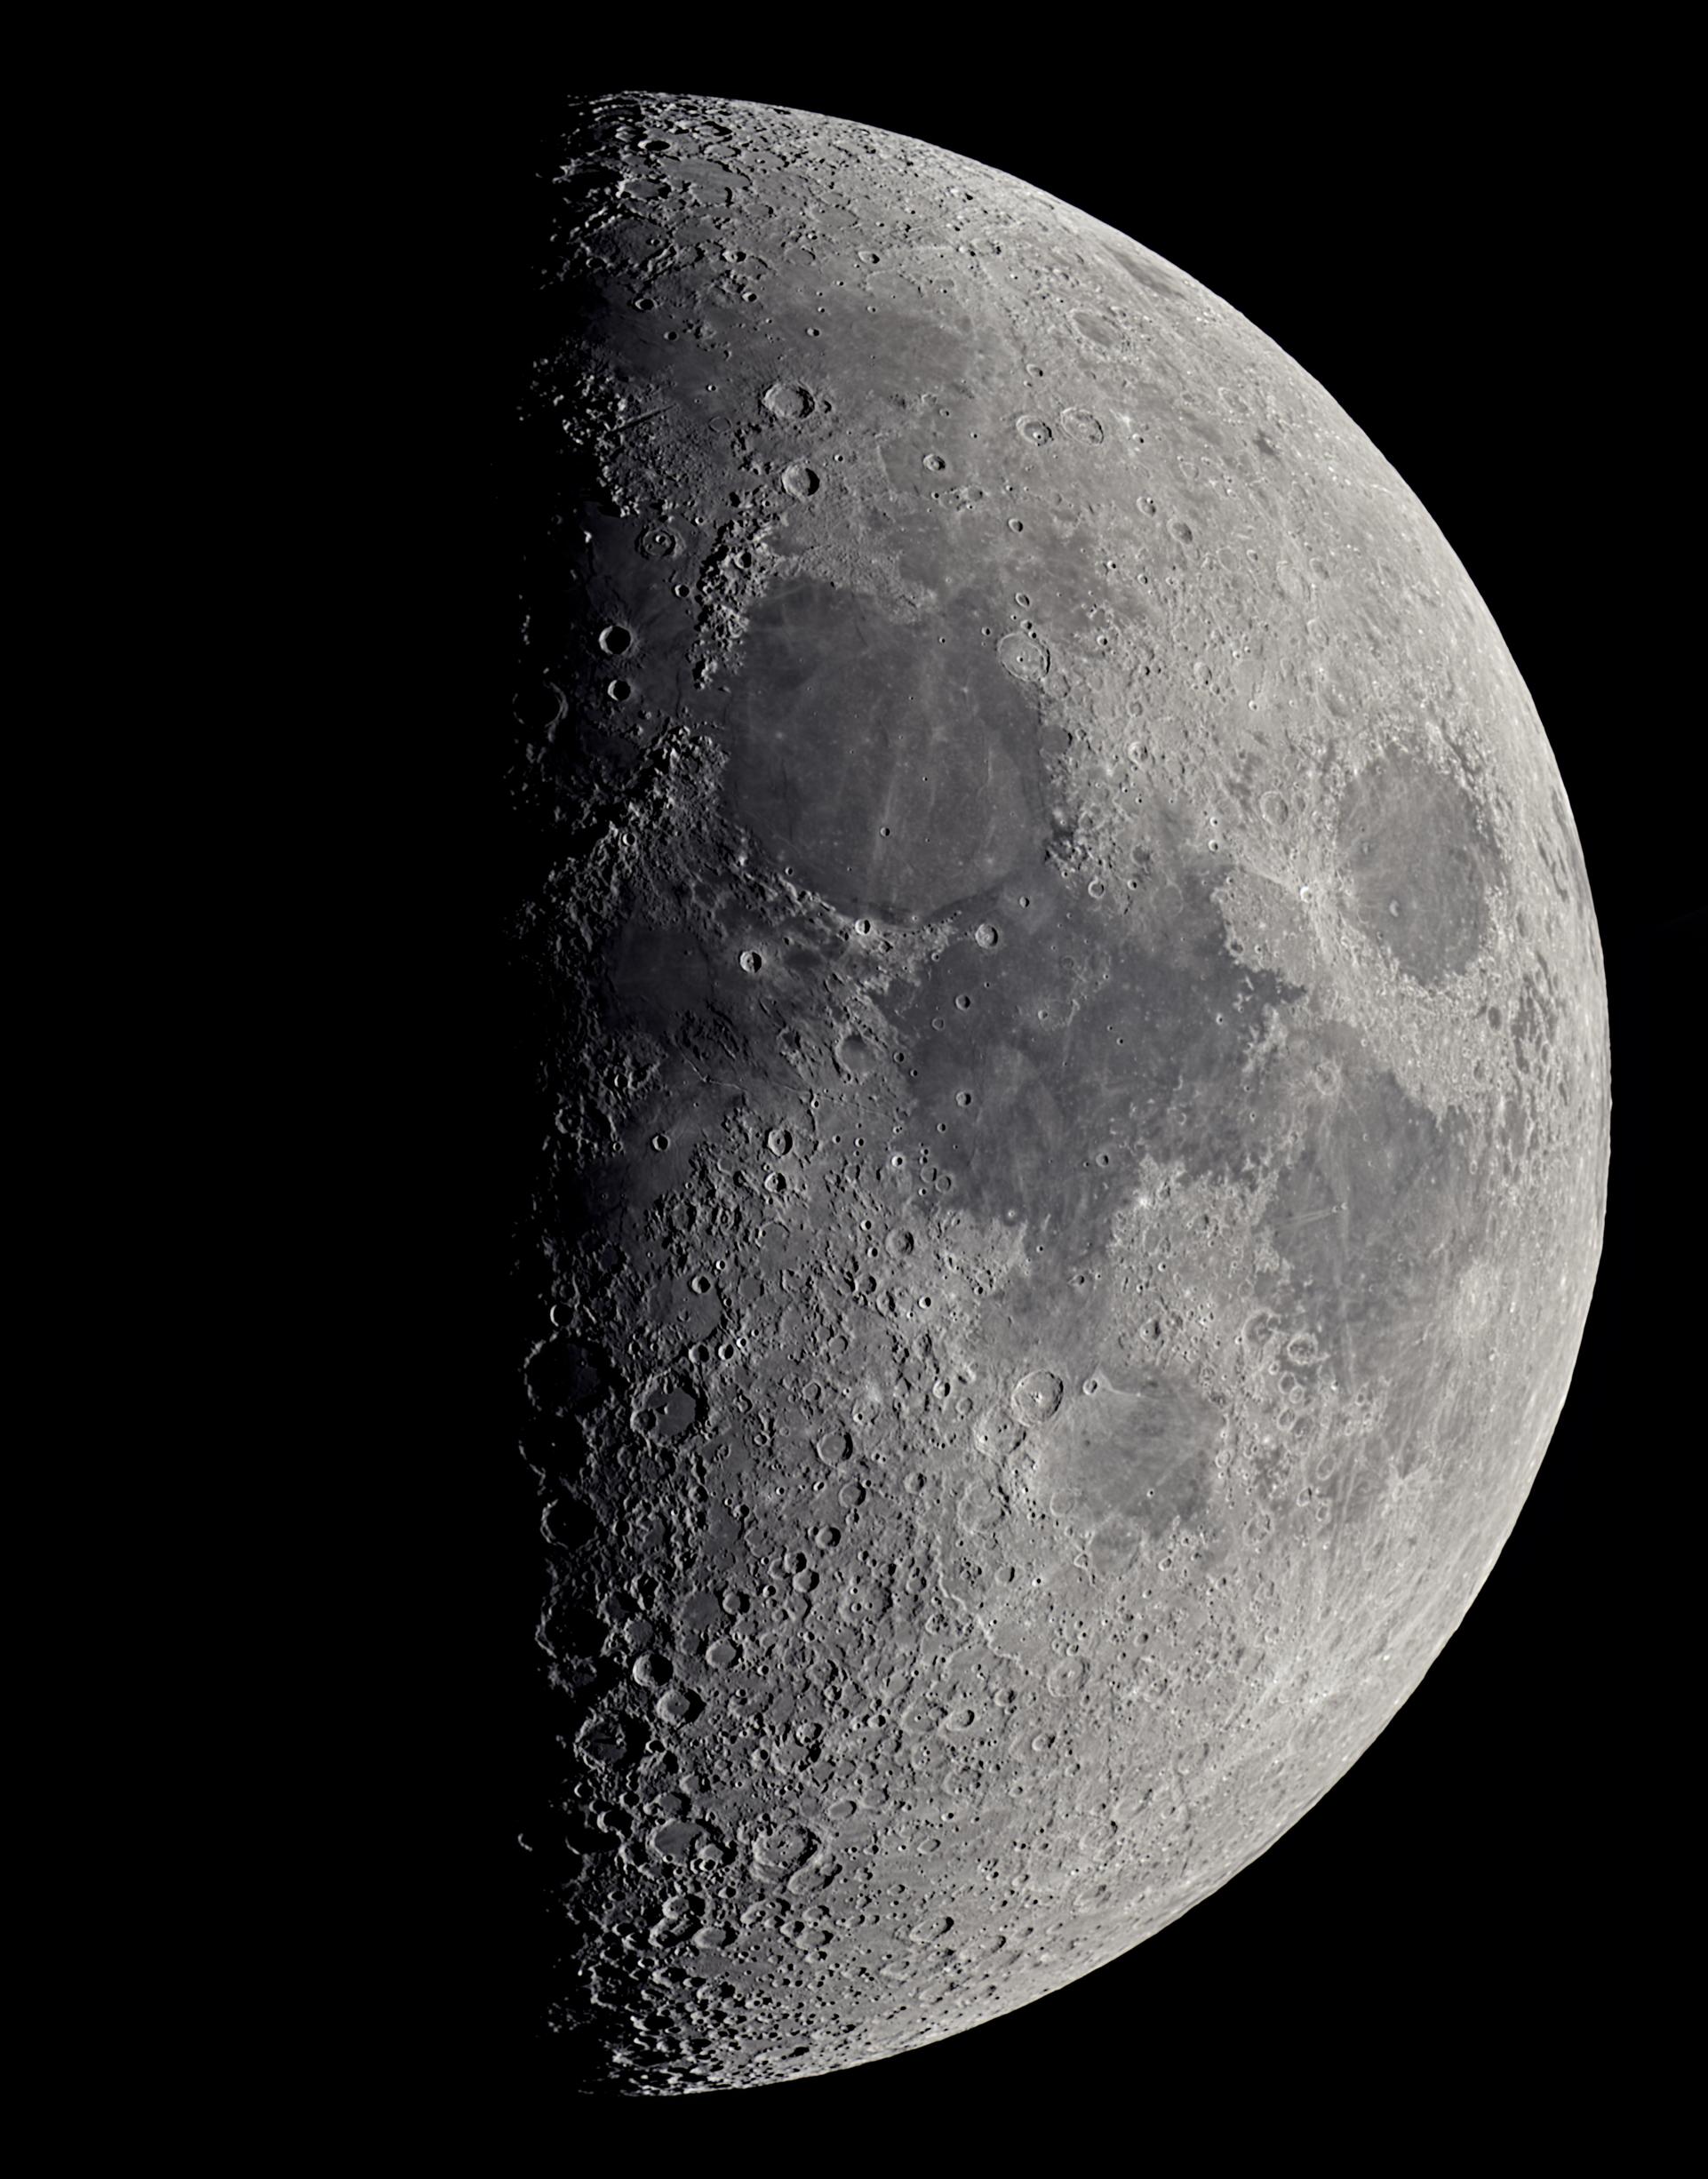 Mond 7.8 Tage (ca. 29° über dem Horizont)